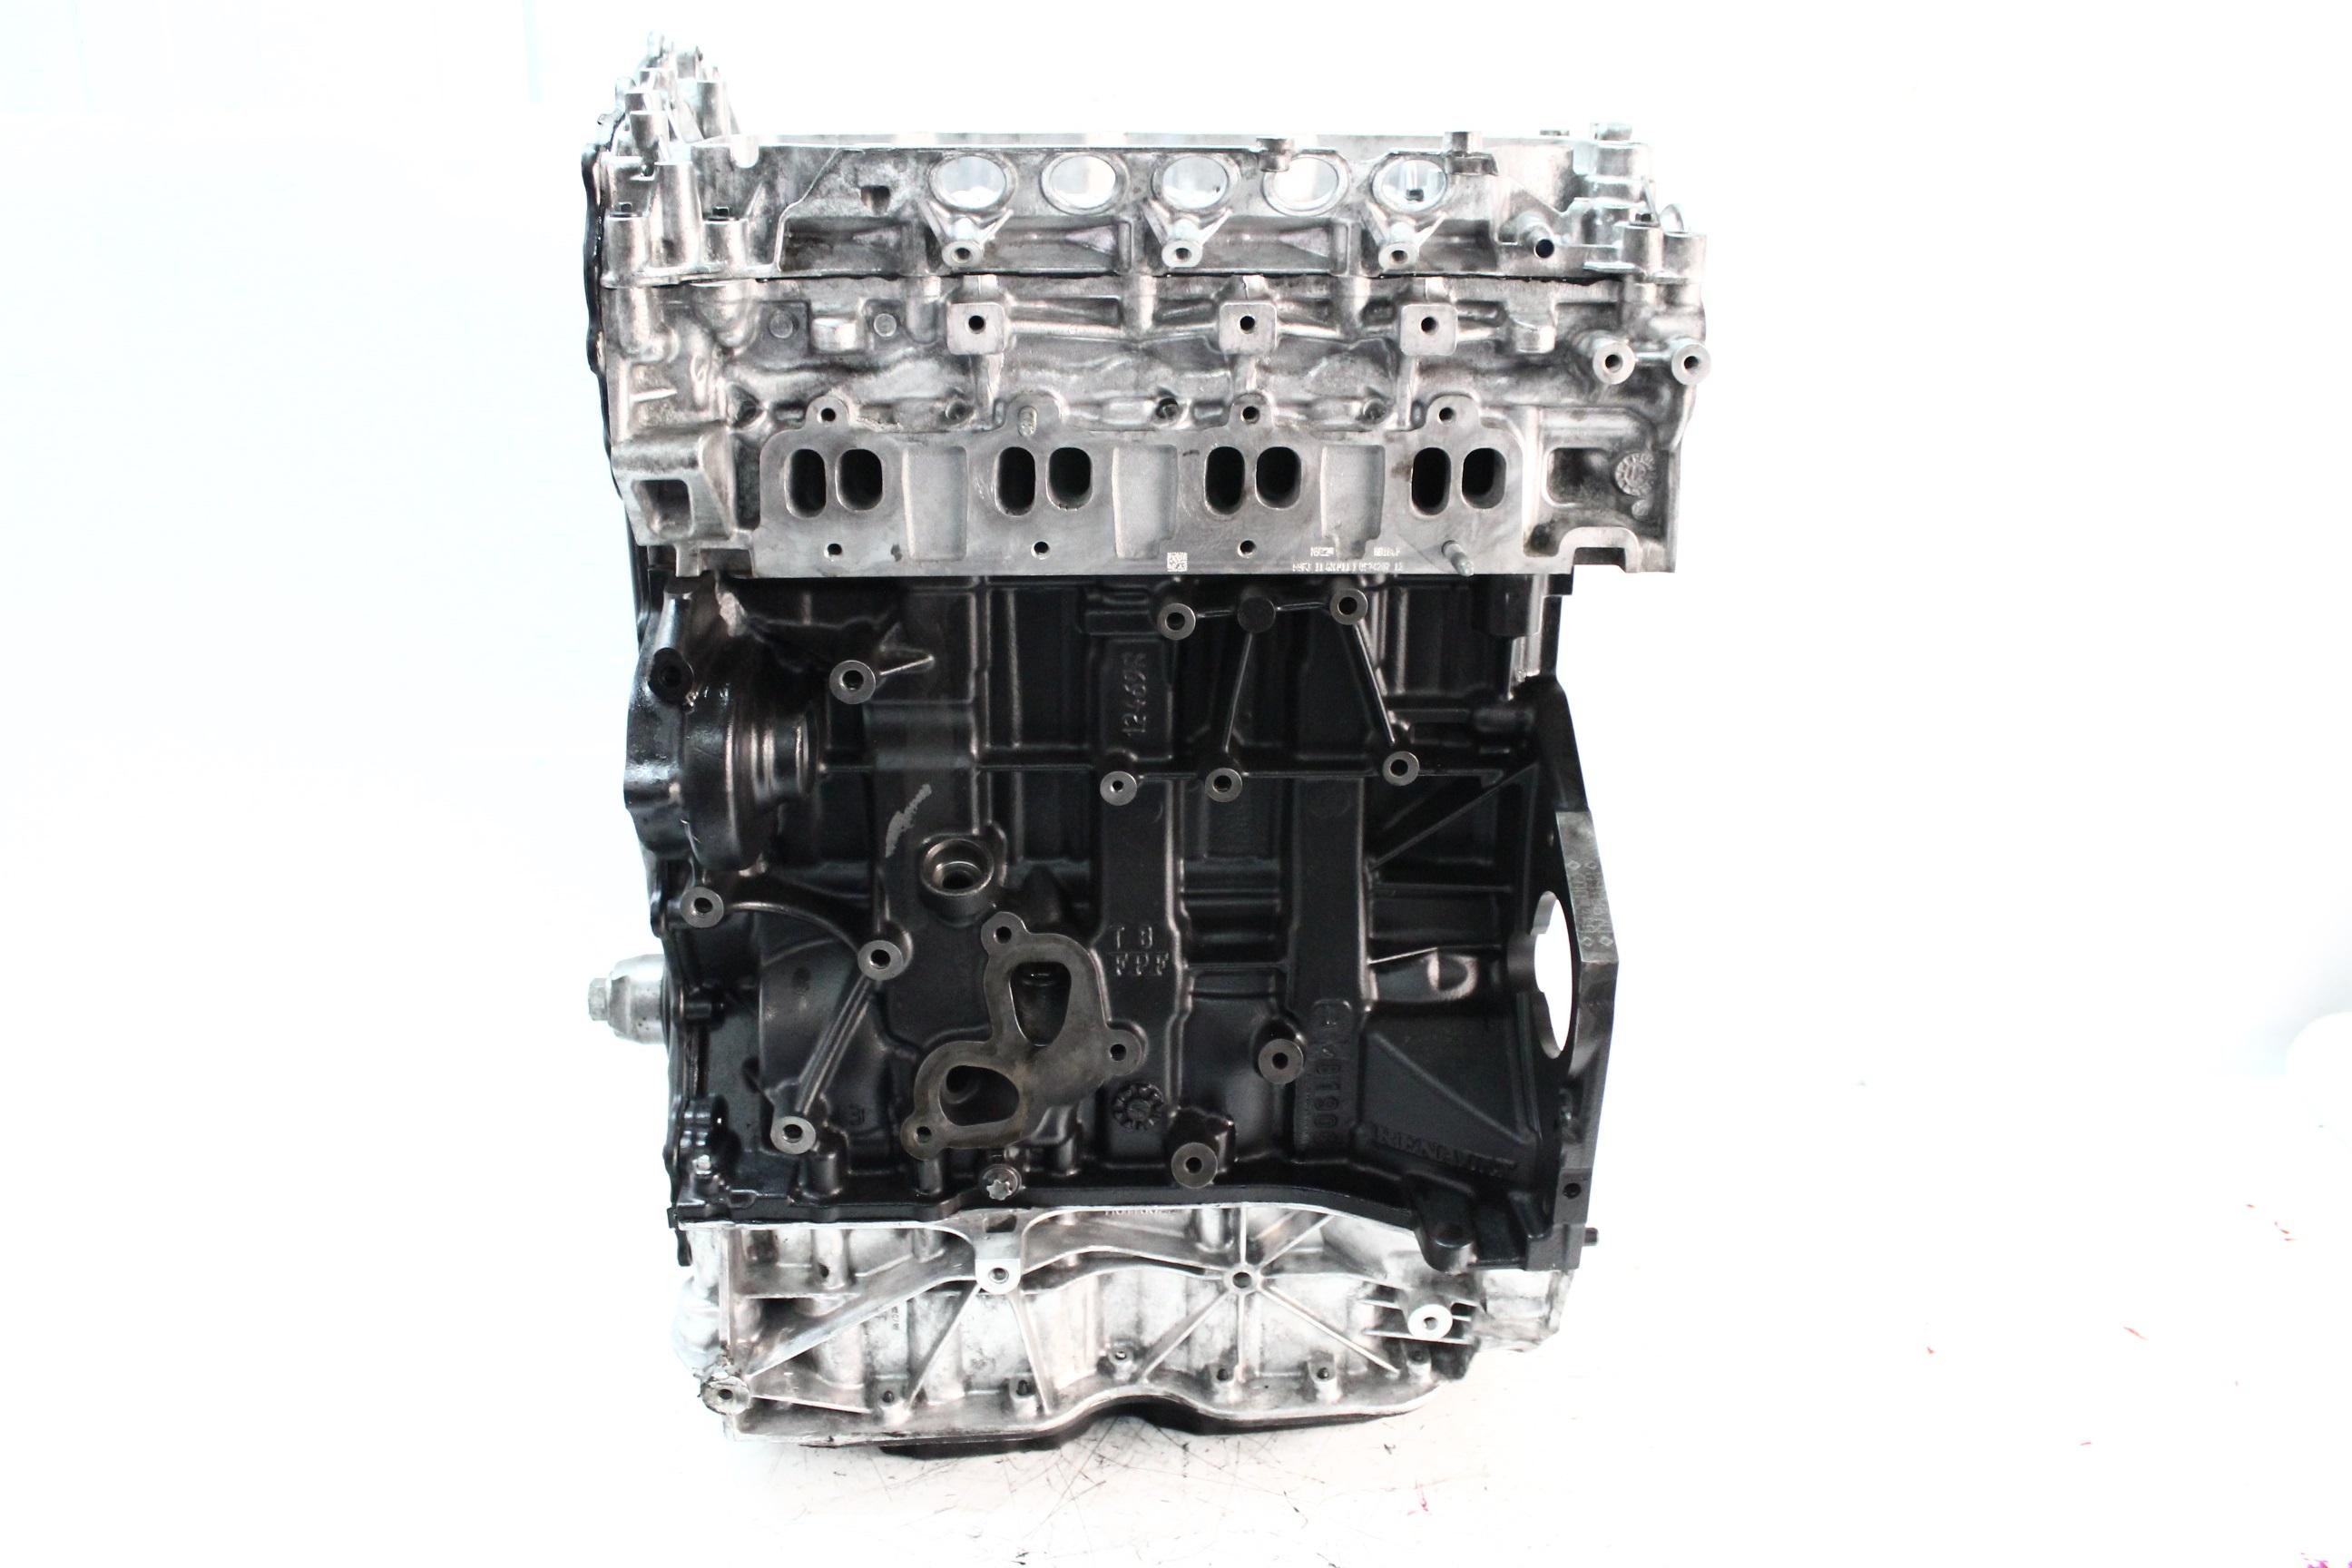 Motor 2012 Renault für Nissan Opel Master Movano NV400 2,3 D CDTI M9T M9T870